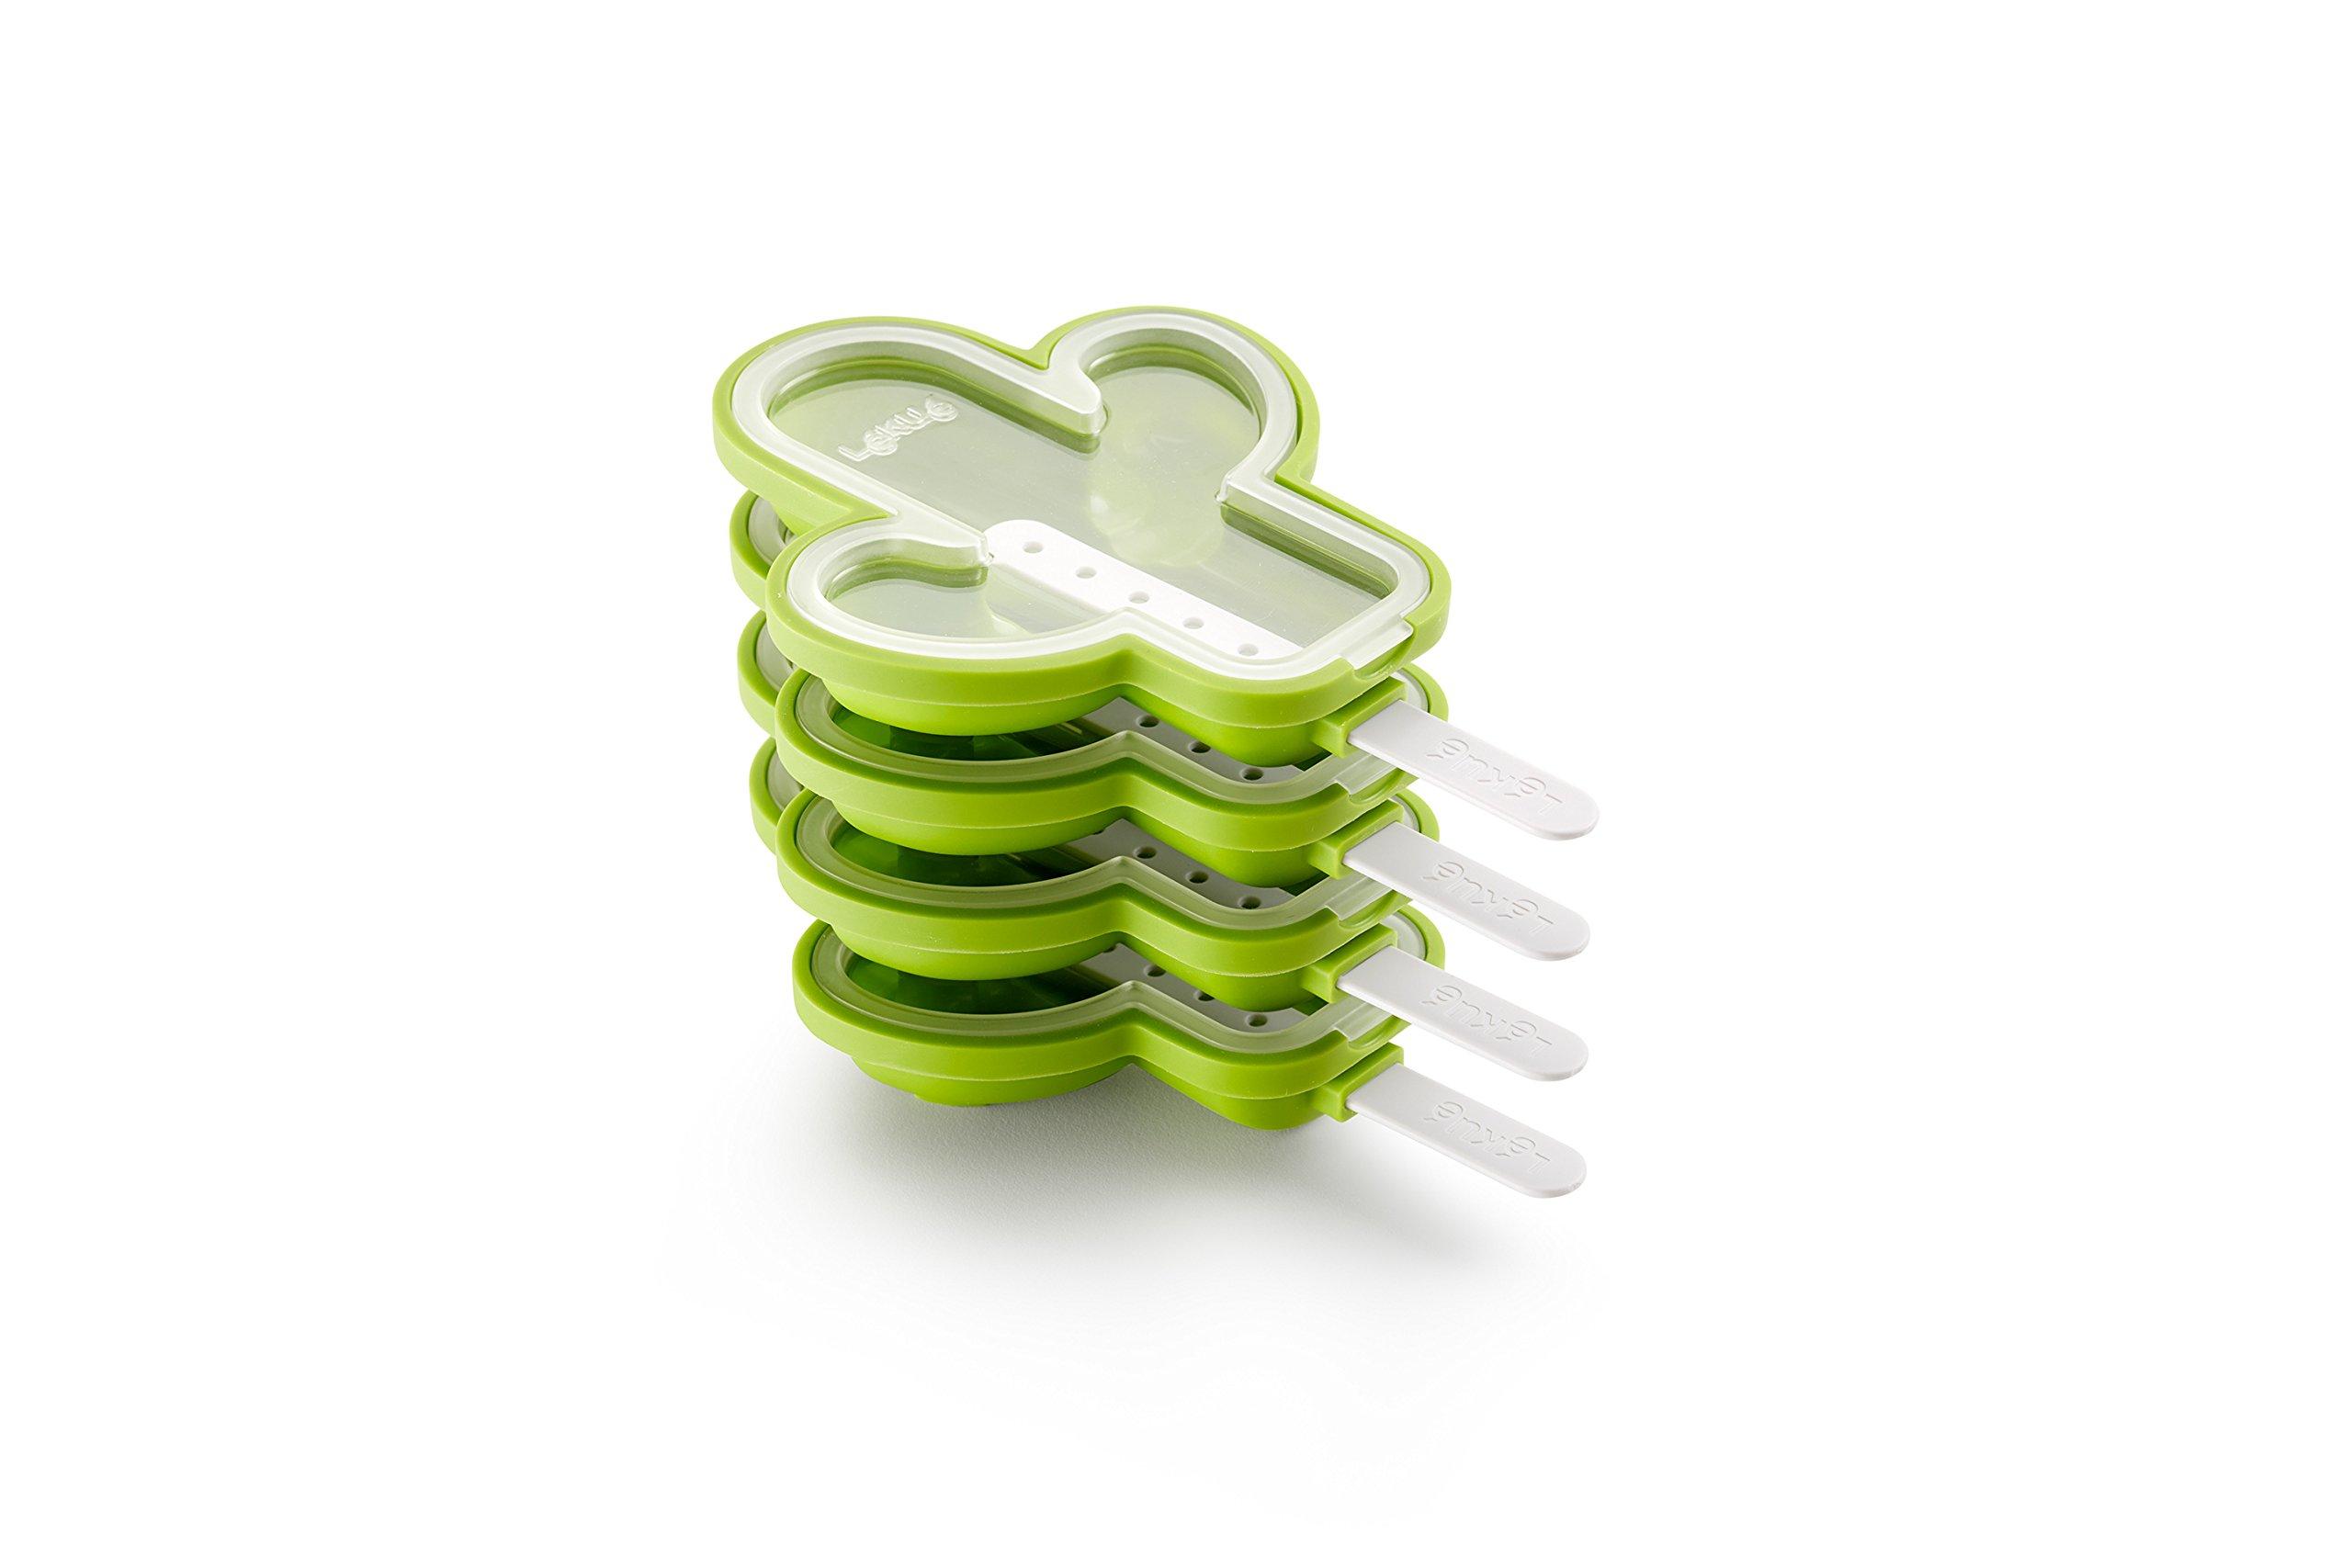 Lekue 3400264S01U150 Cactus Ice-Cream Mold, Green